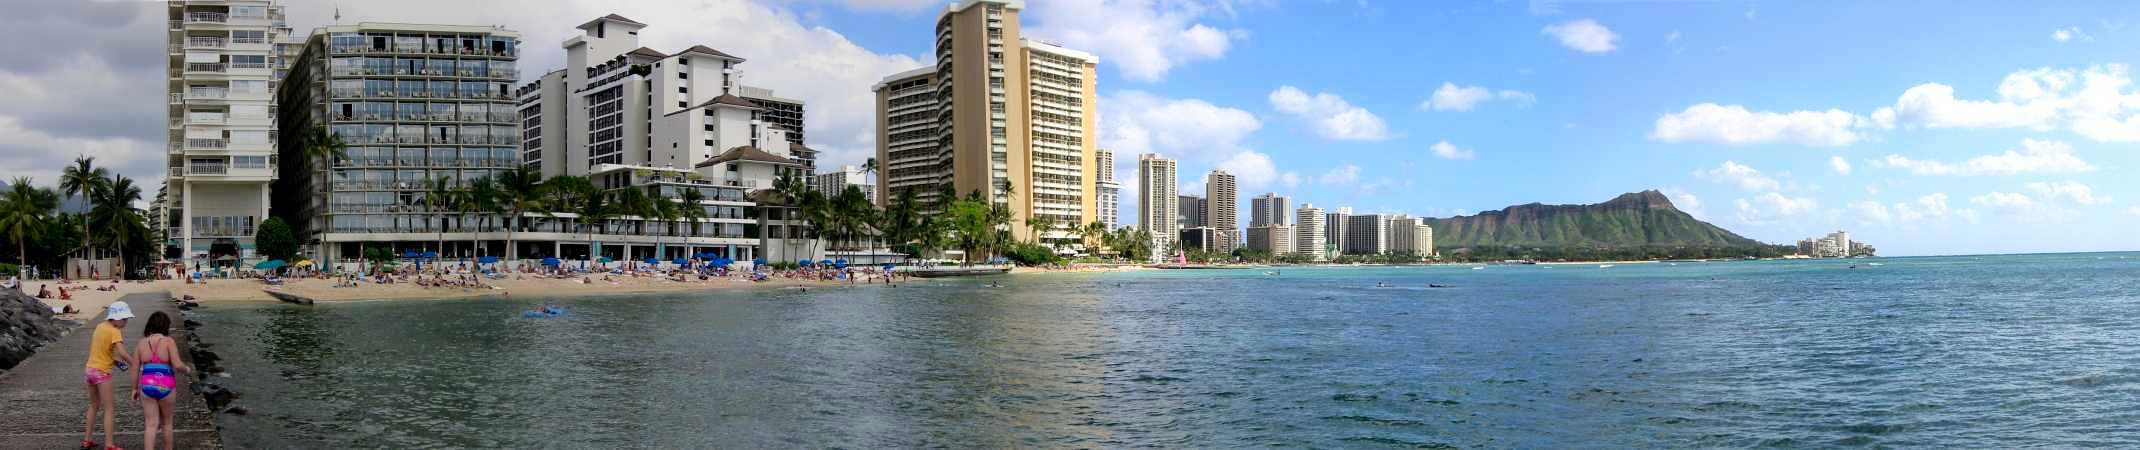 Waikiki Beach Marriott Resort Spa Package Hotel Transfer